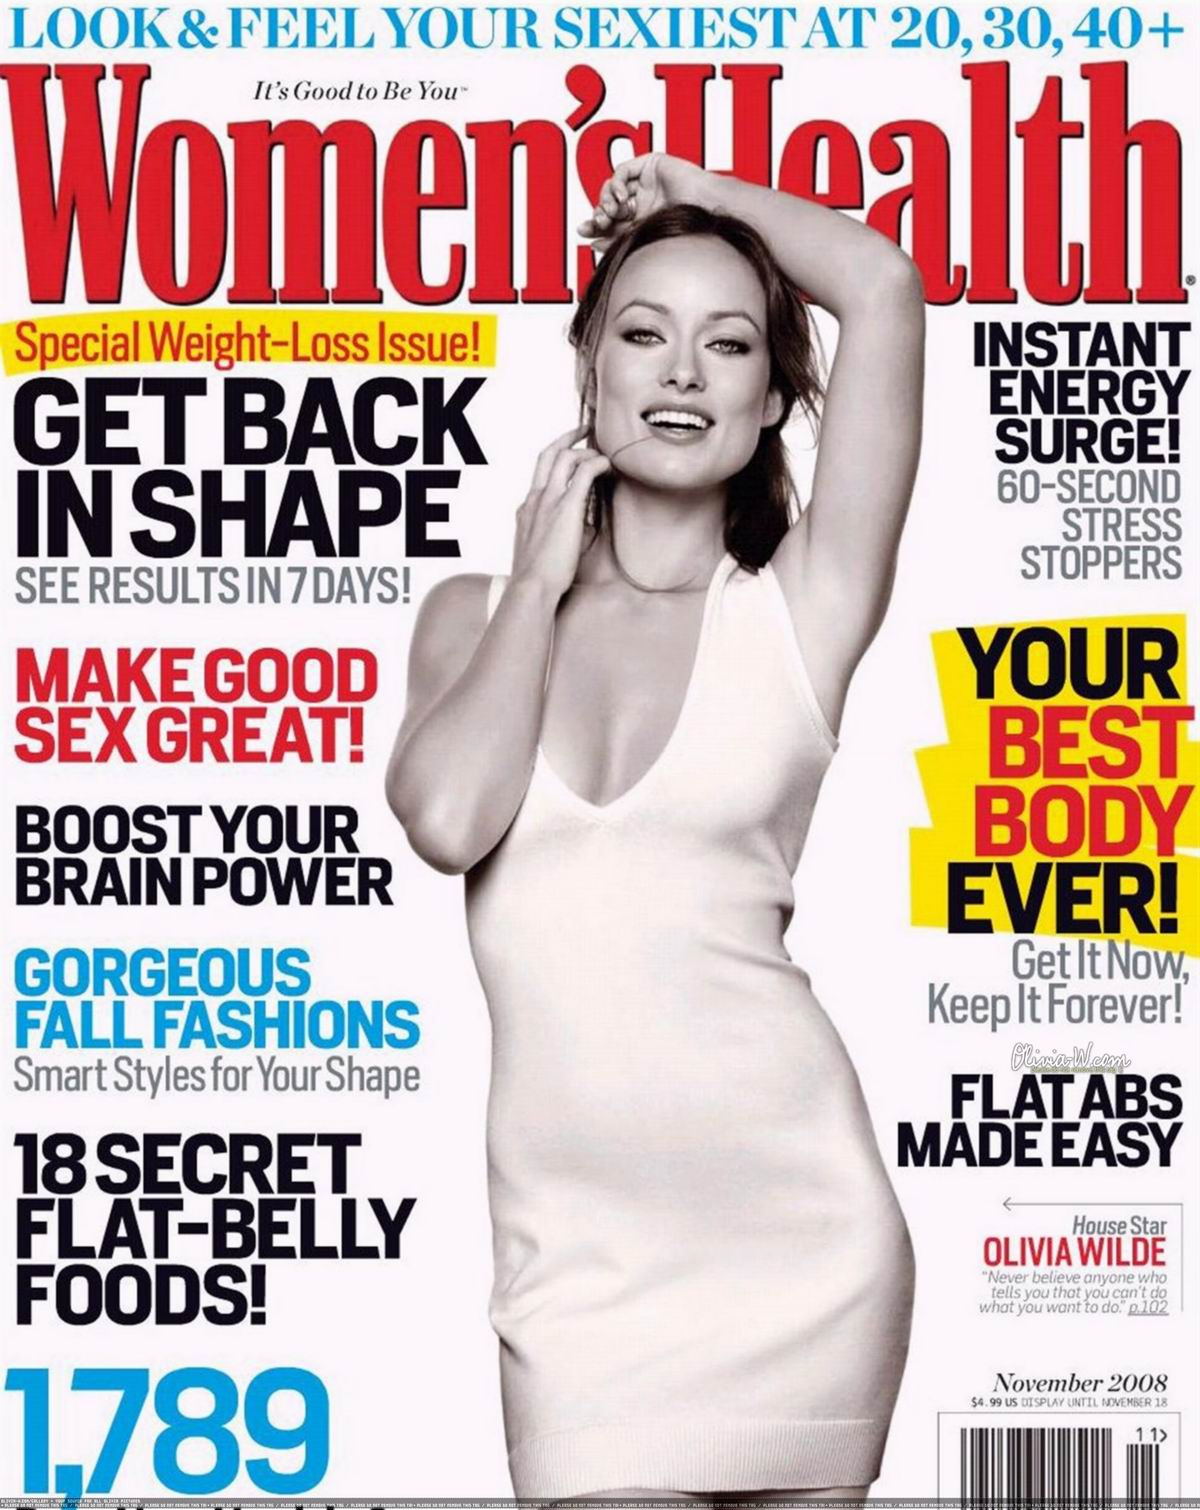 Оливия Уайлд (Olivia Wilde) фото в журнале Women's Health, ноябрь 2008